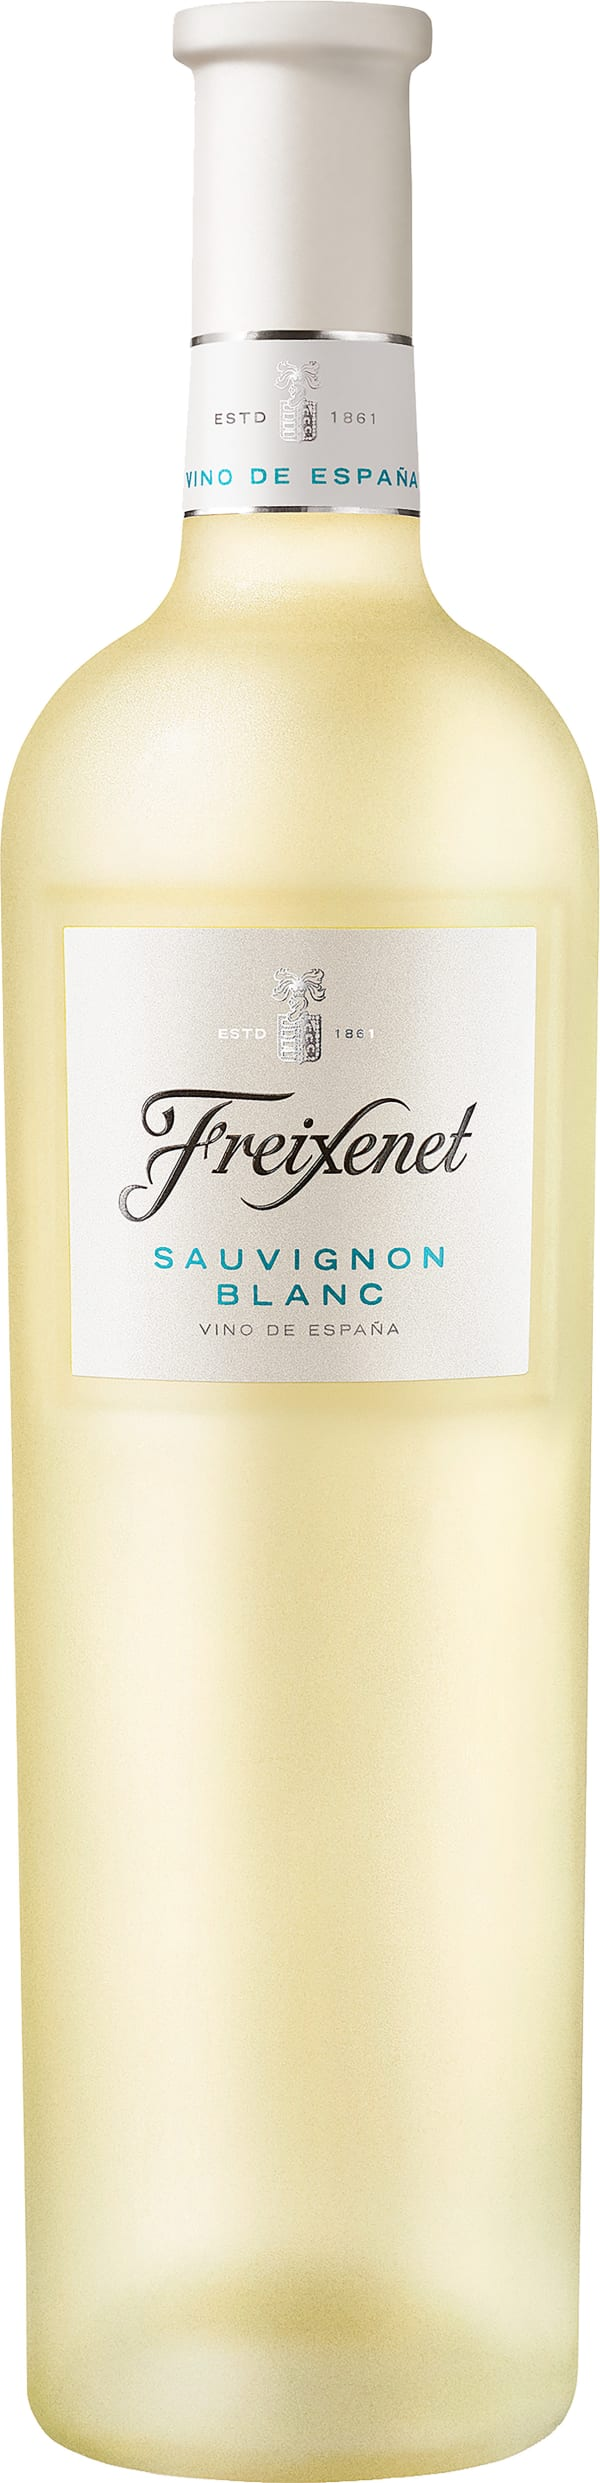 Freixenet Sauvignon Blanc 2020